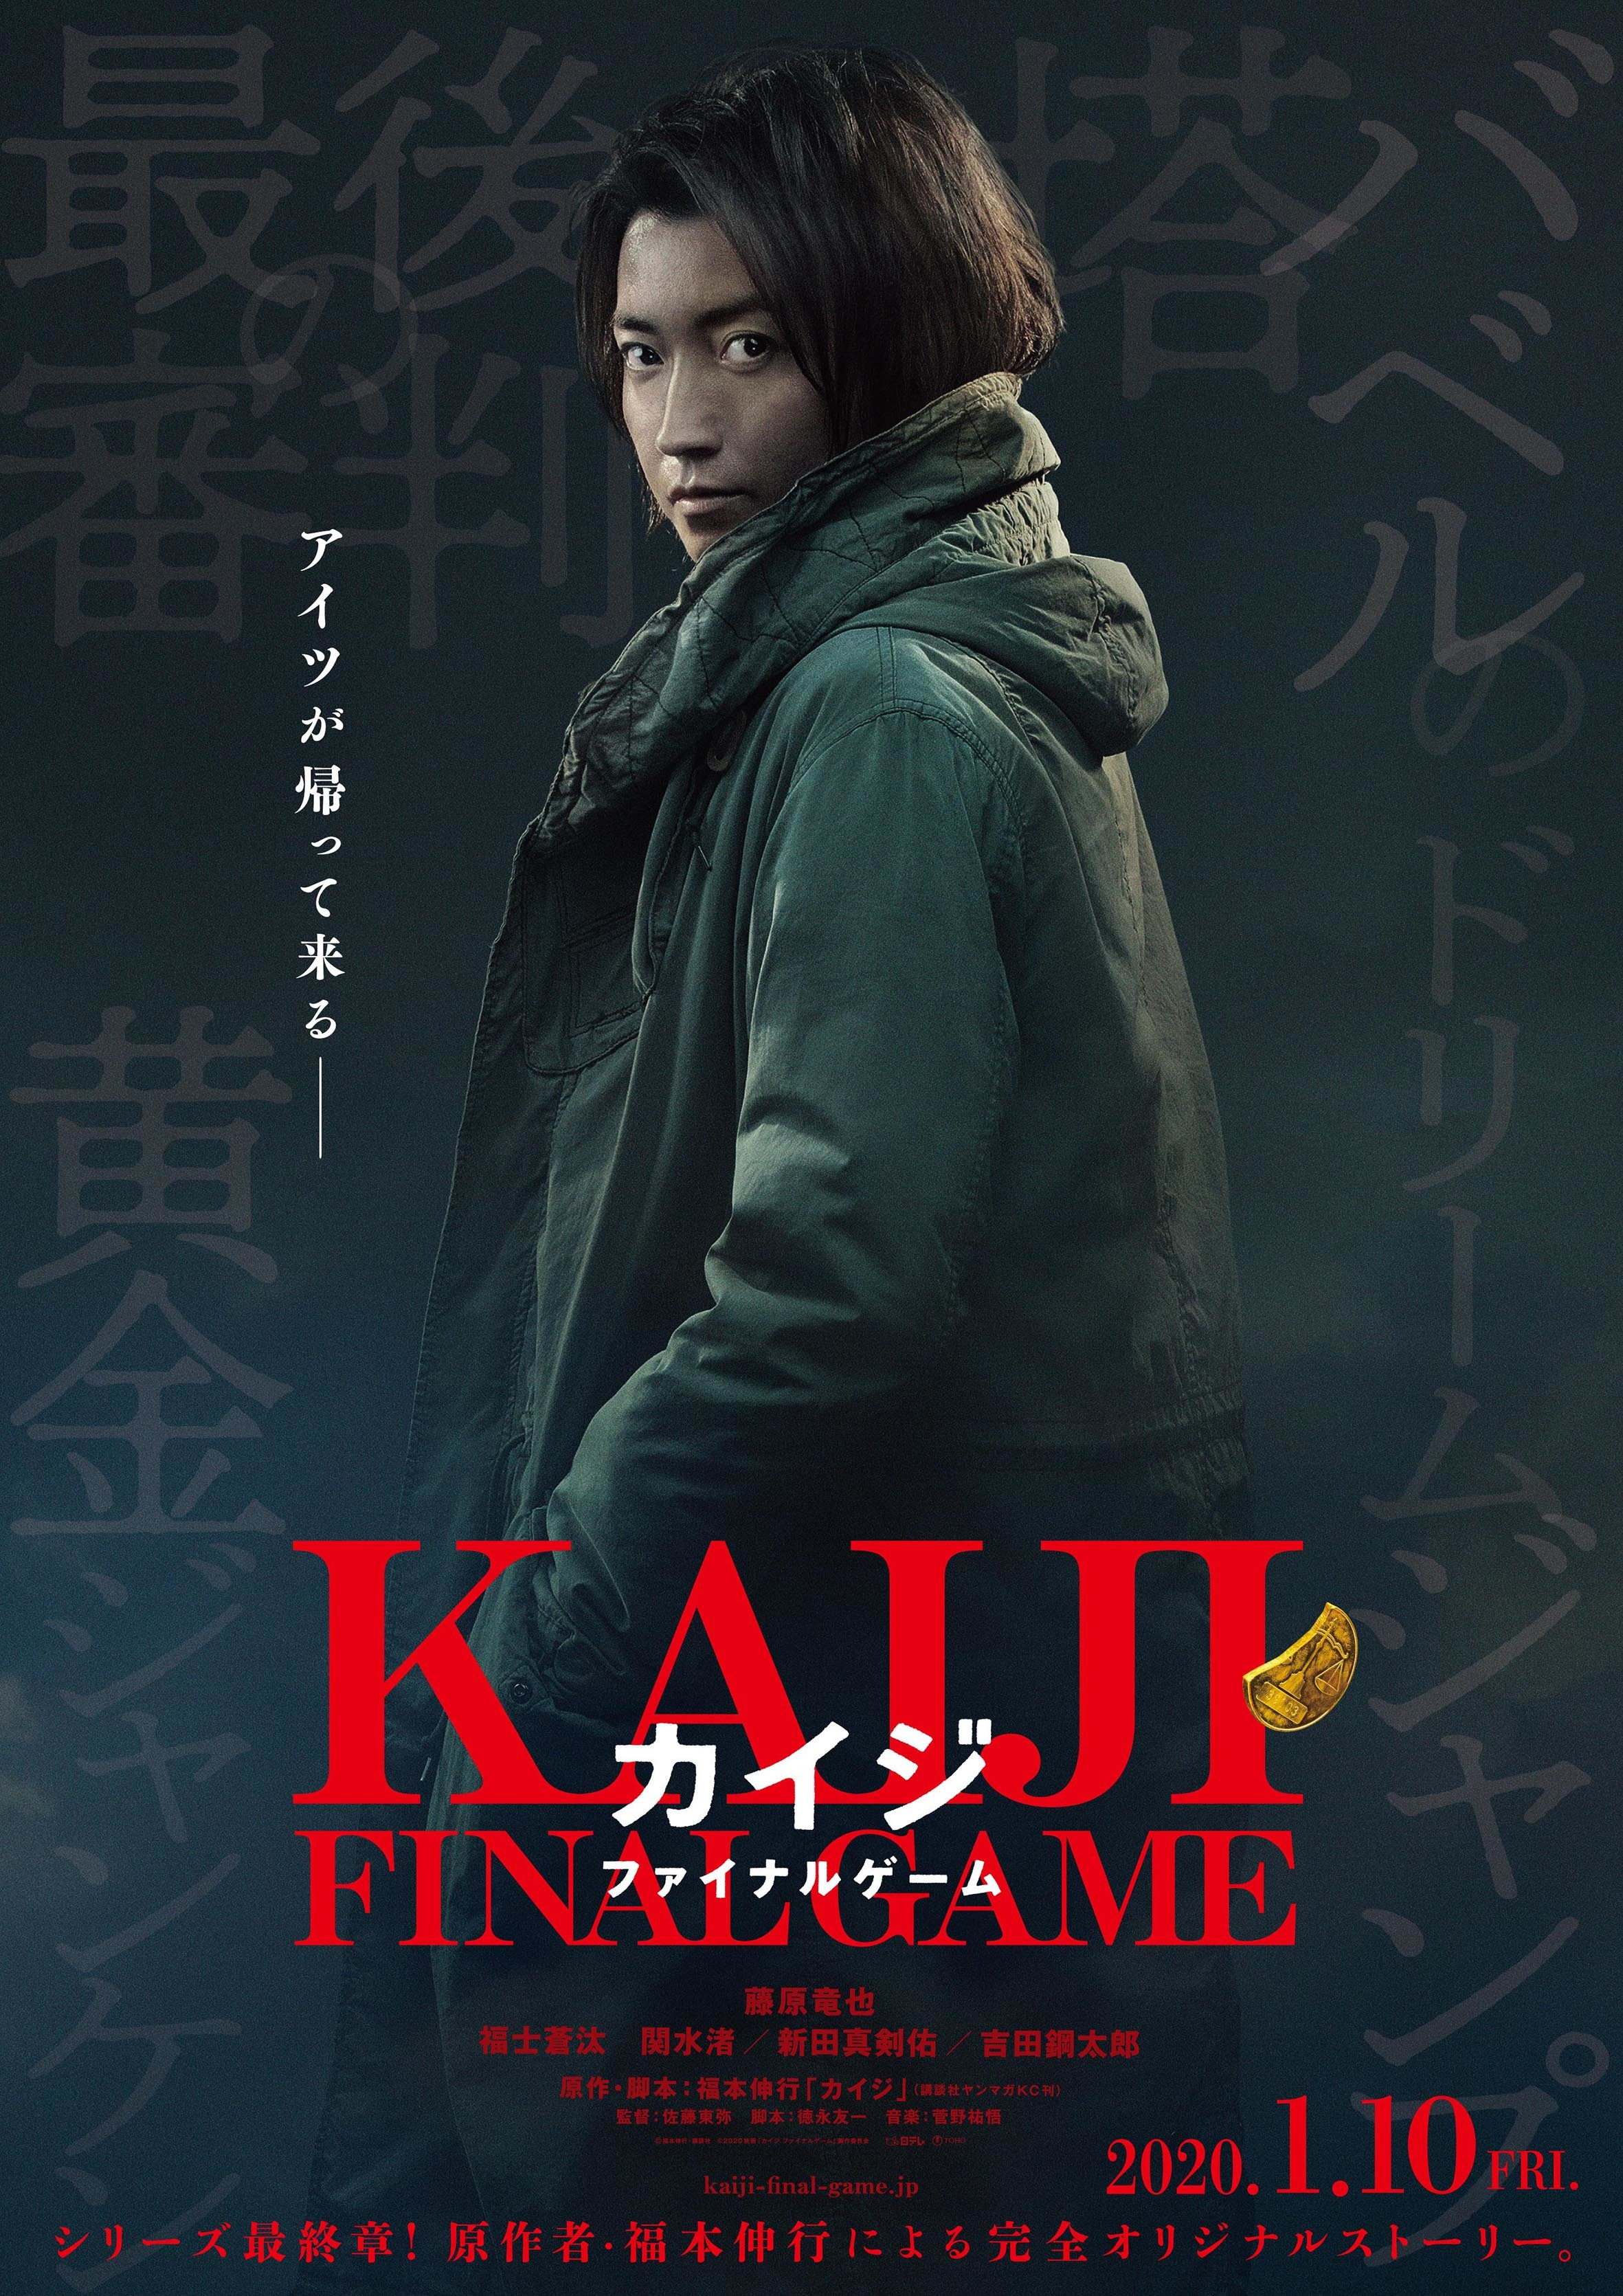 (C)福本伸行 講談社/2020映画「カイジ ファイナルゲーム」製作委員会